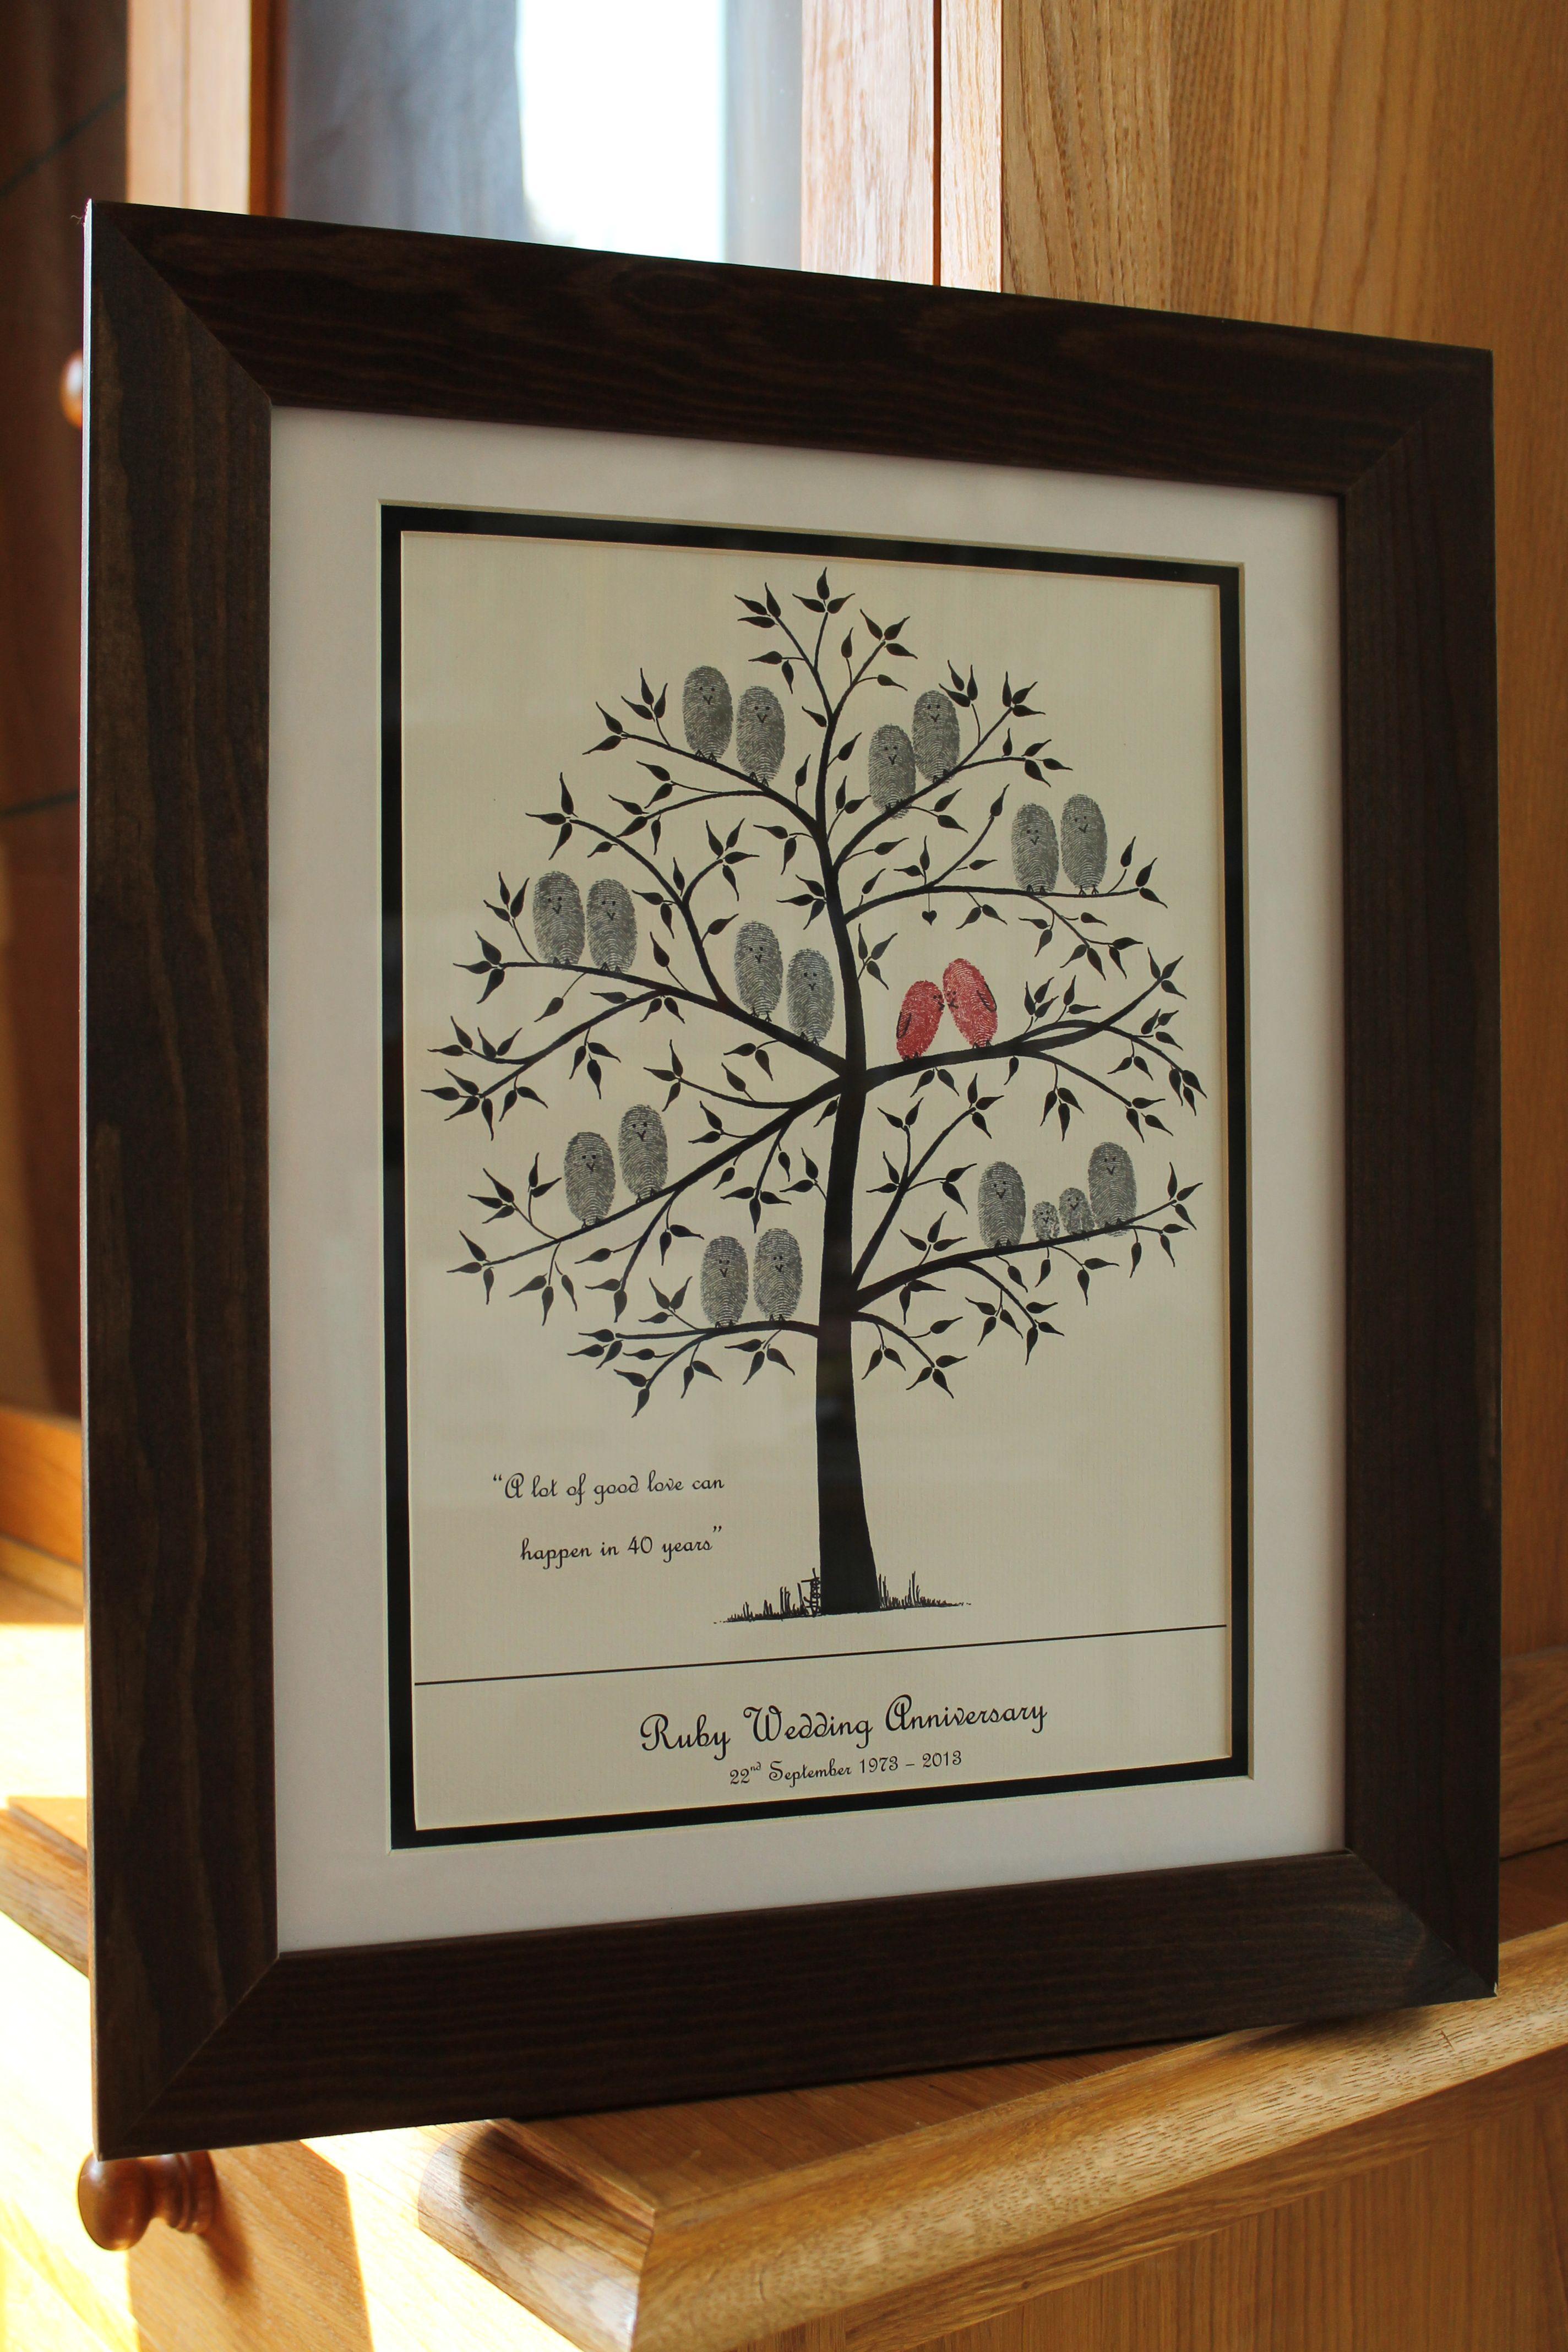 Ruby wedding anniversary fingerprint tree for mum and dad hostess